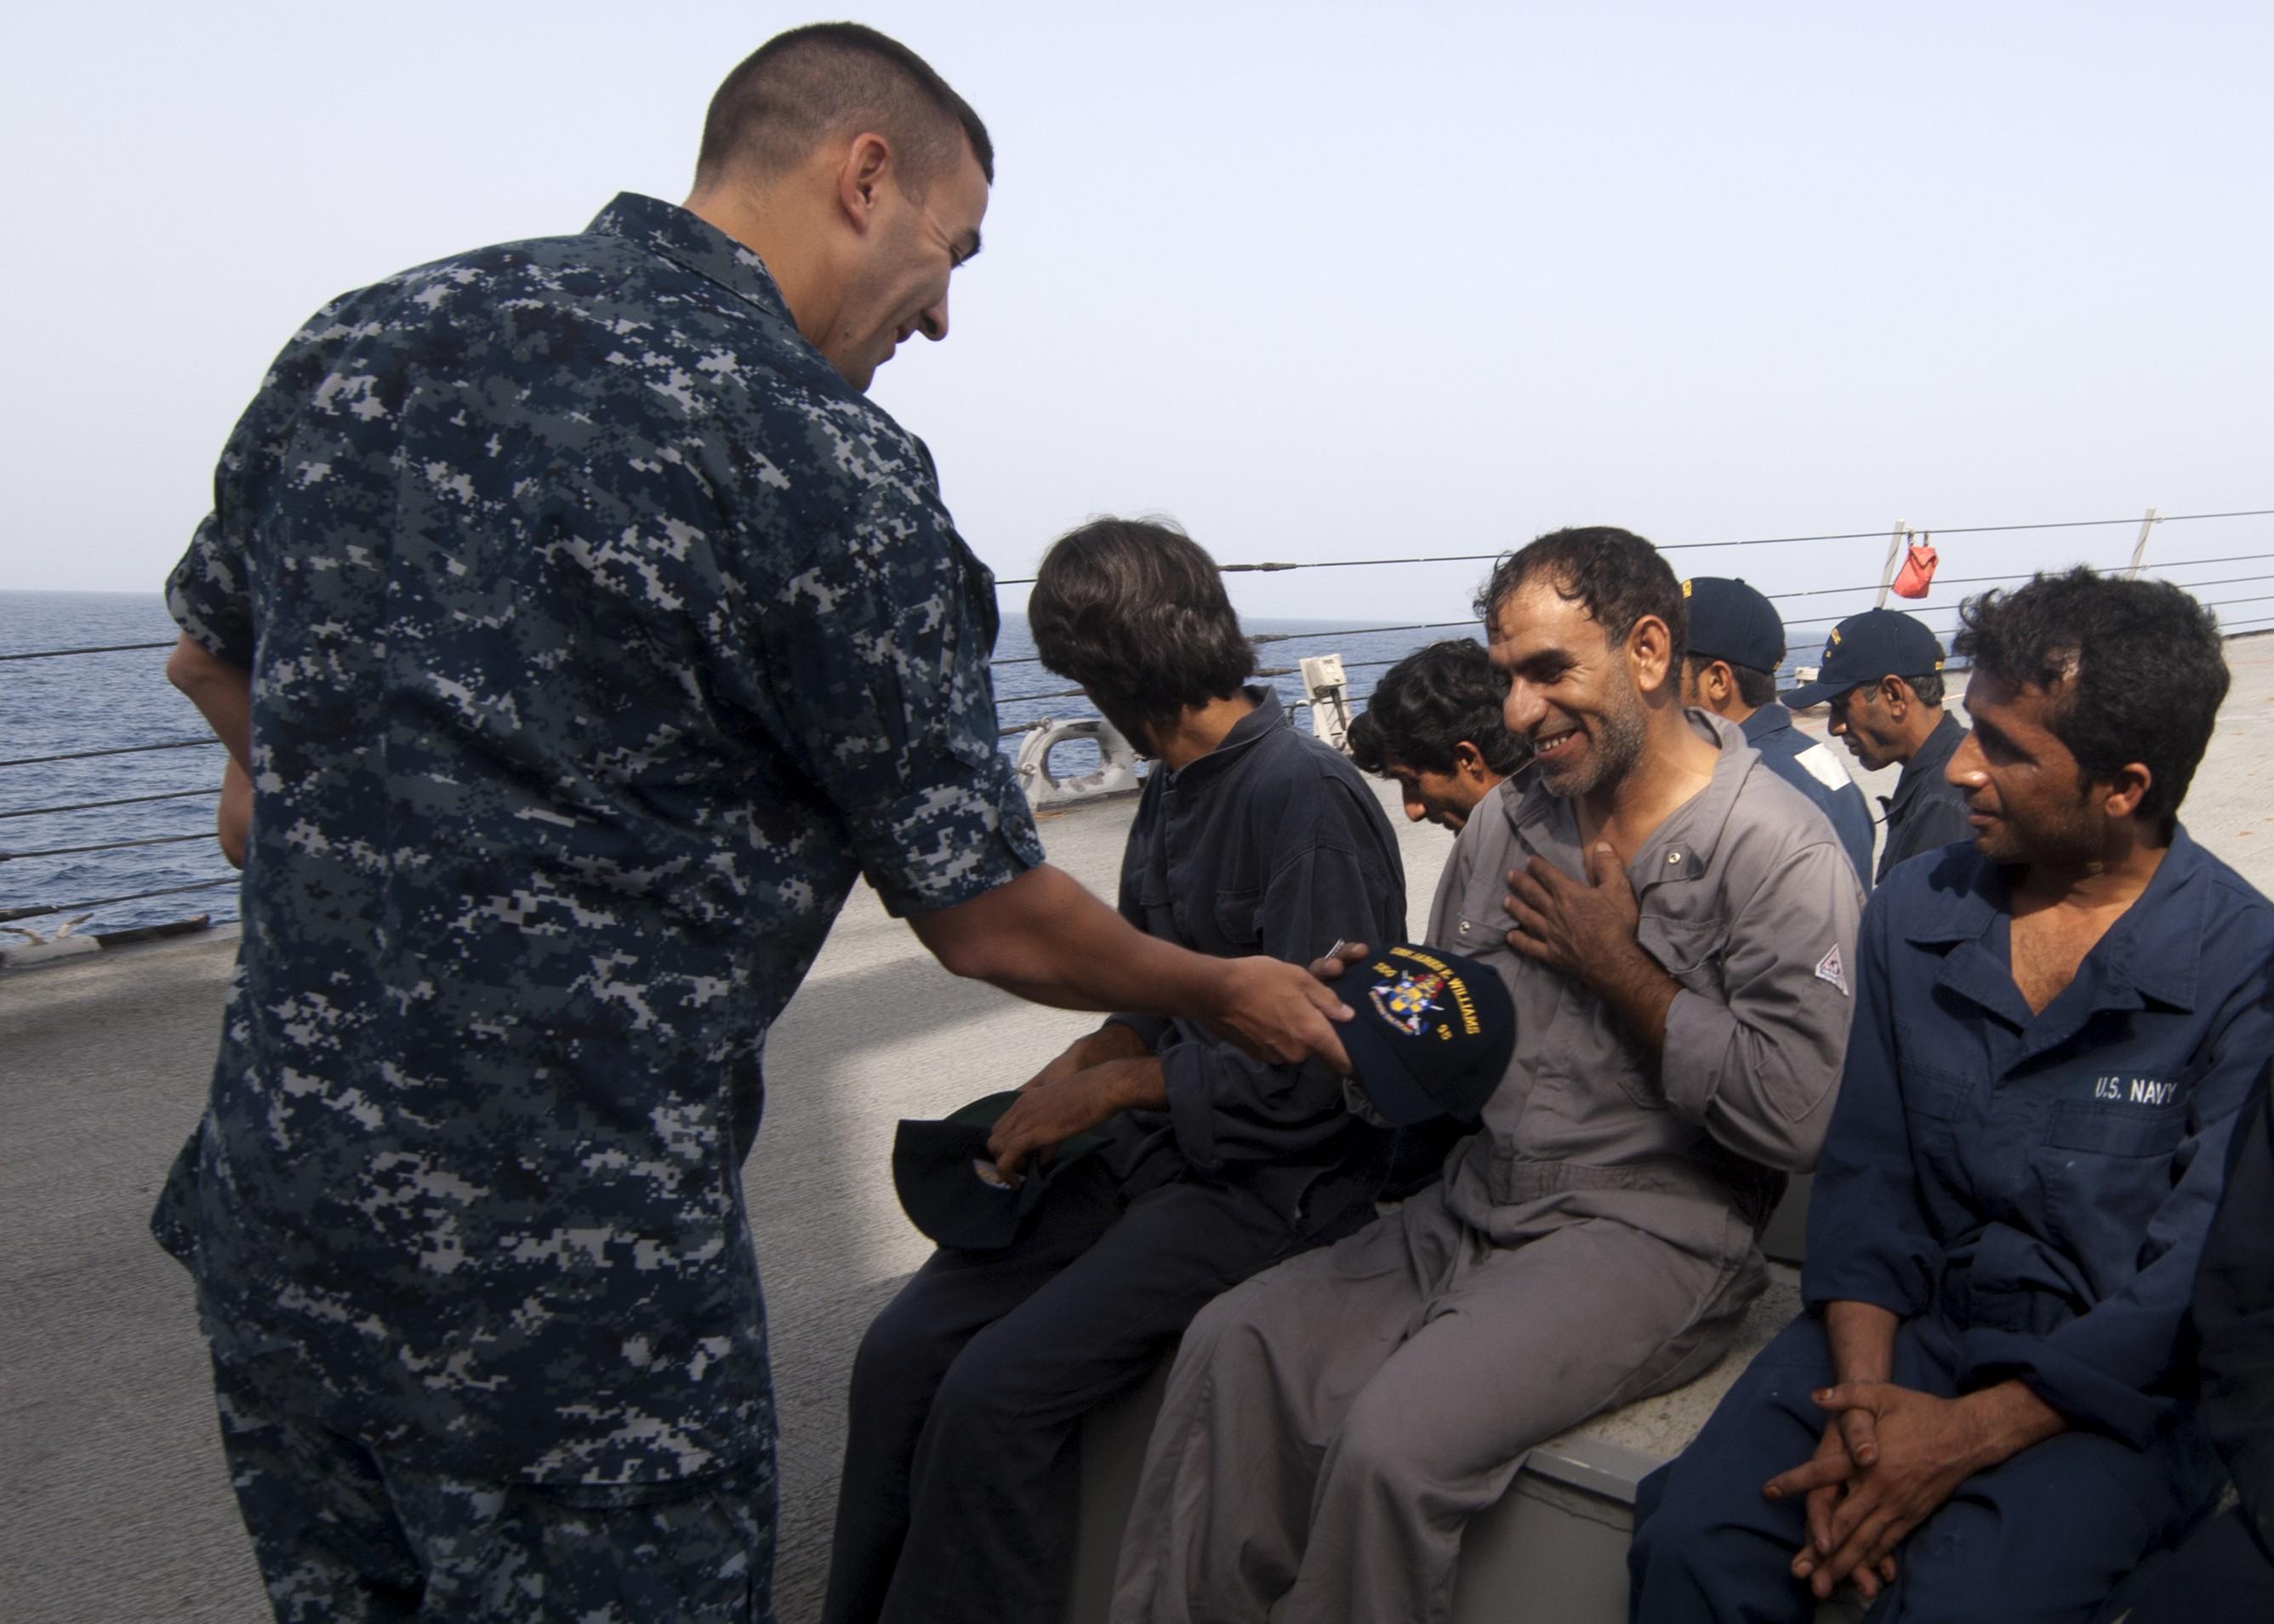 james e. williams iranian mariners rescue us navy Christopher Senenko